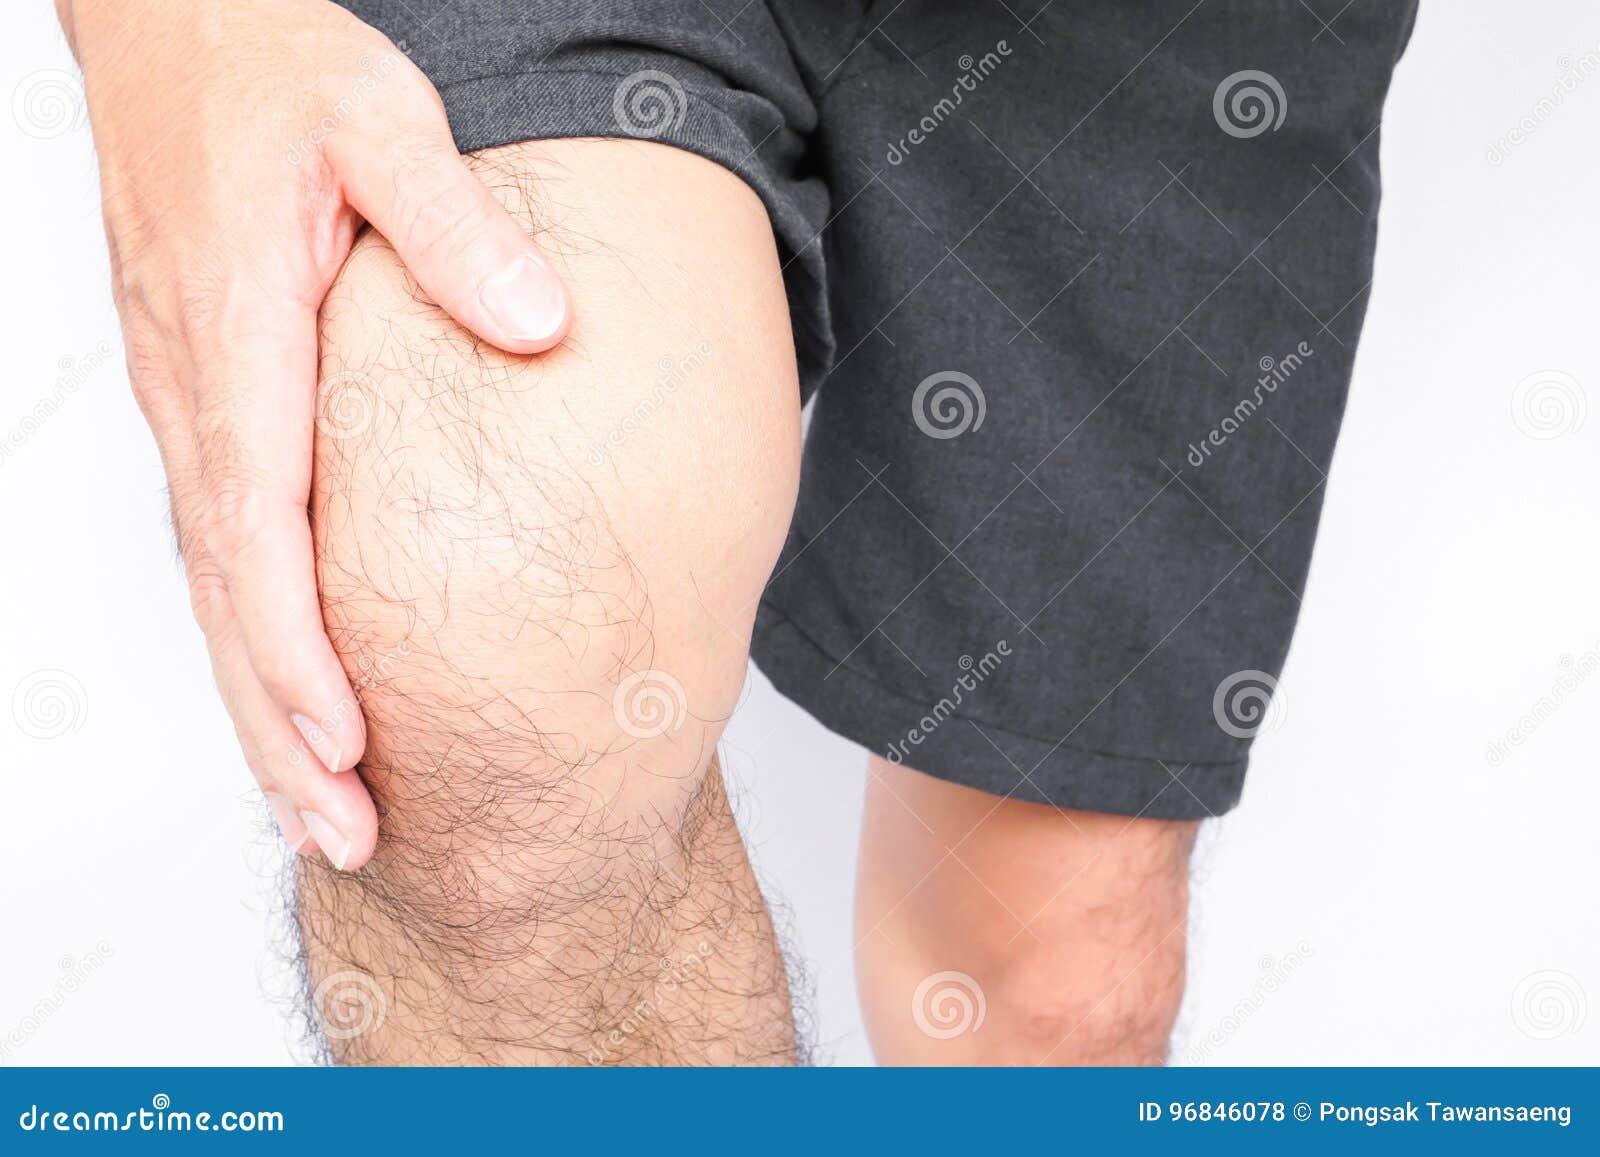 Closeup Man Hand Hold Knee With Pain Symptom Health Care And Me